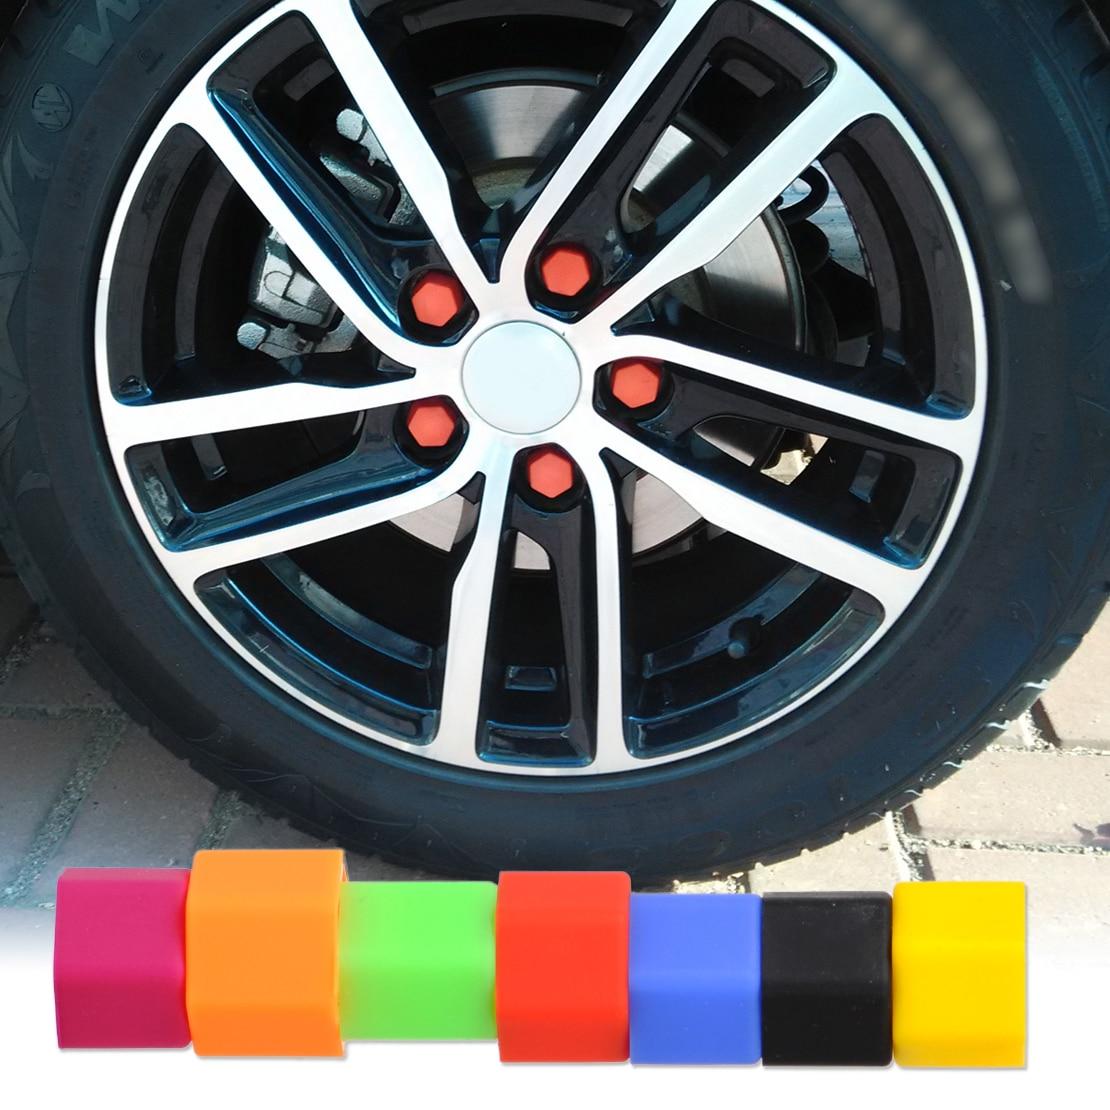 DWCX 20pcs 21mm Silicone Hexagon Car Wheel Lug Nut Bolt Cover Protective Tyre Valve Screw Cap for Audi A3 A4 BMW E46 E90 VW